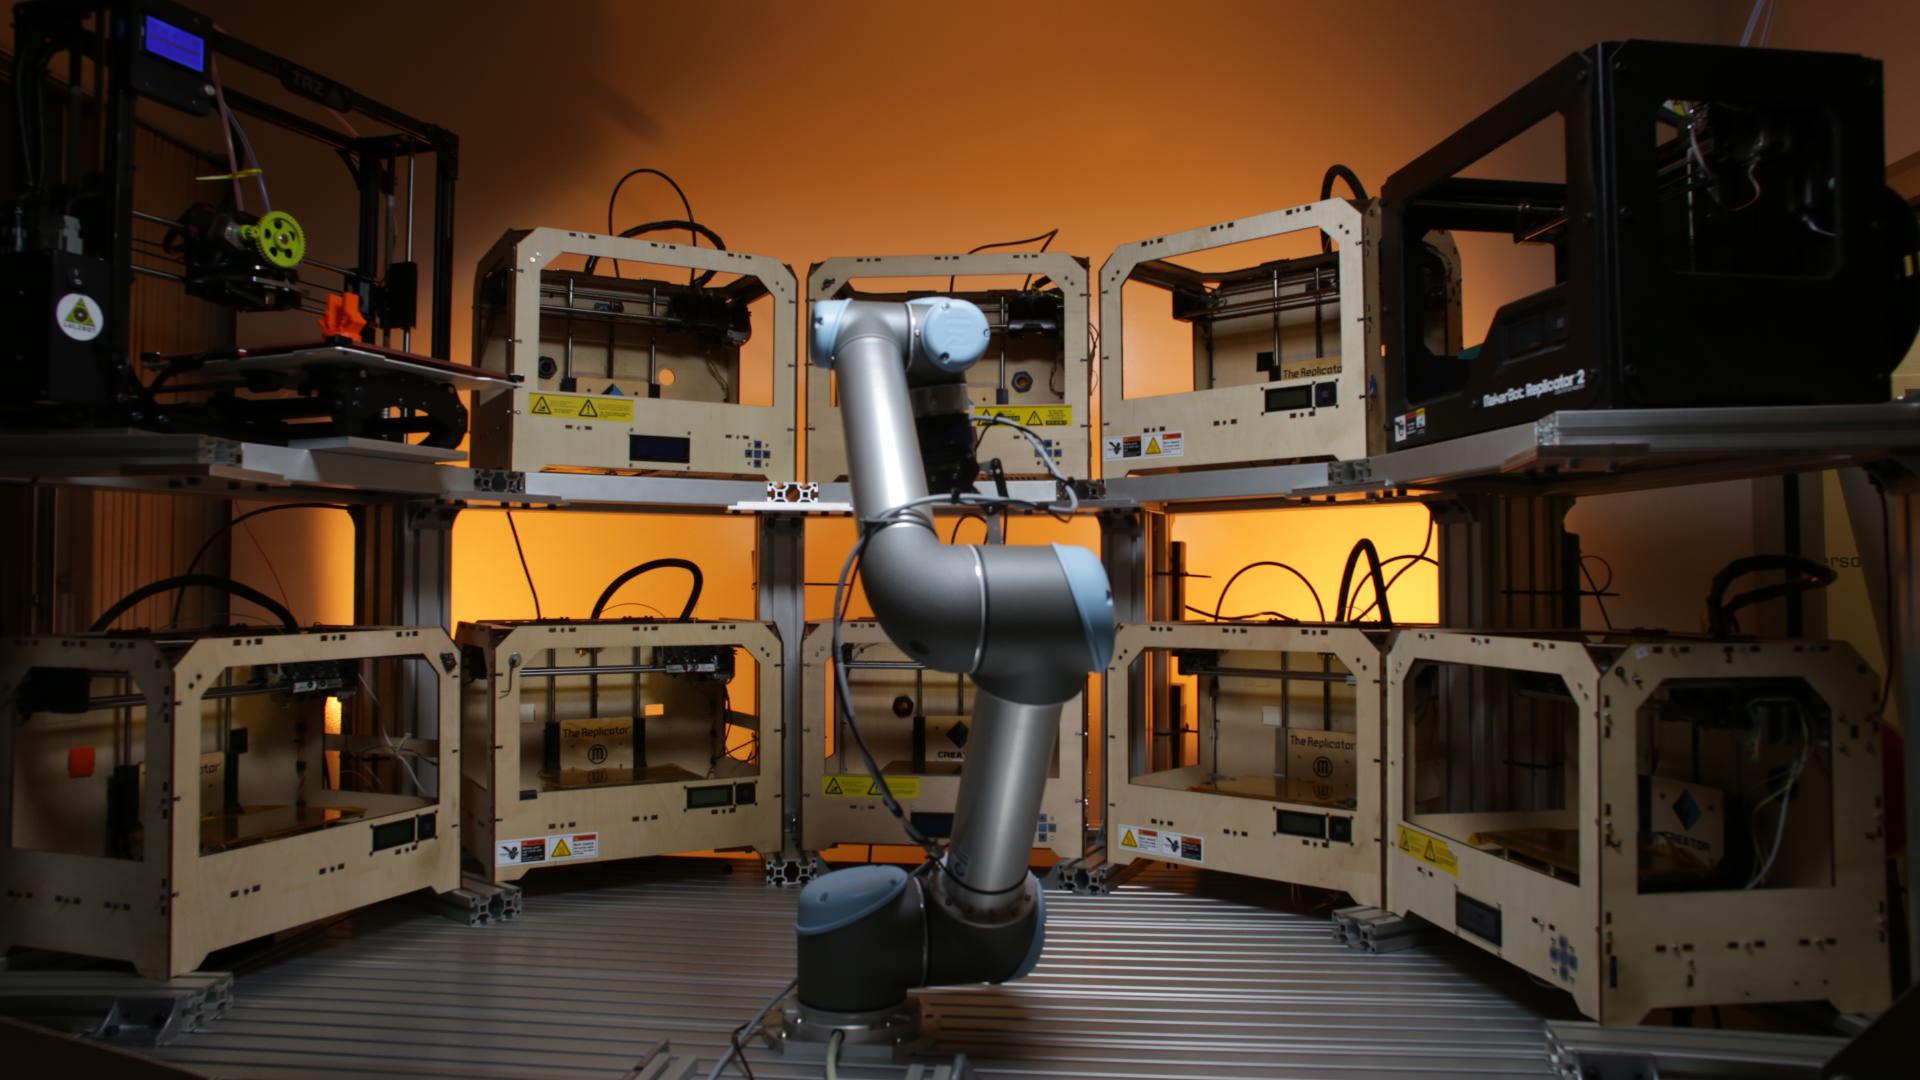 tend-ai-robot_and_3D_printers-2